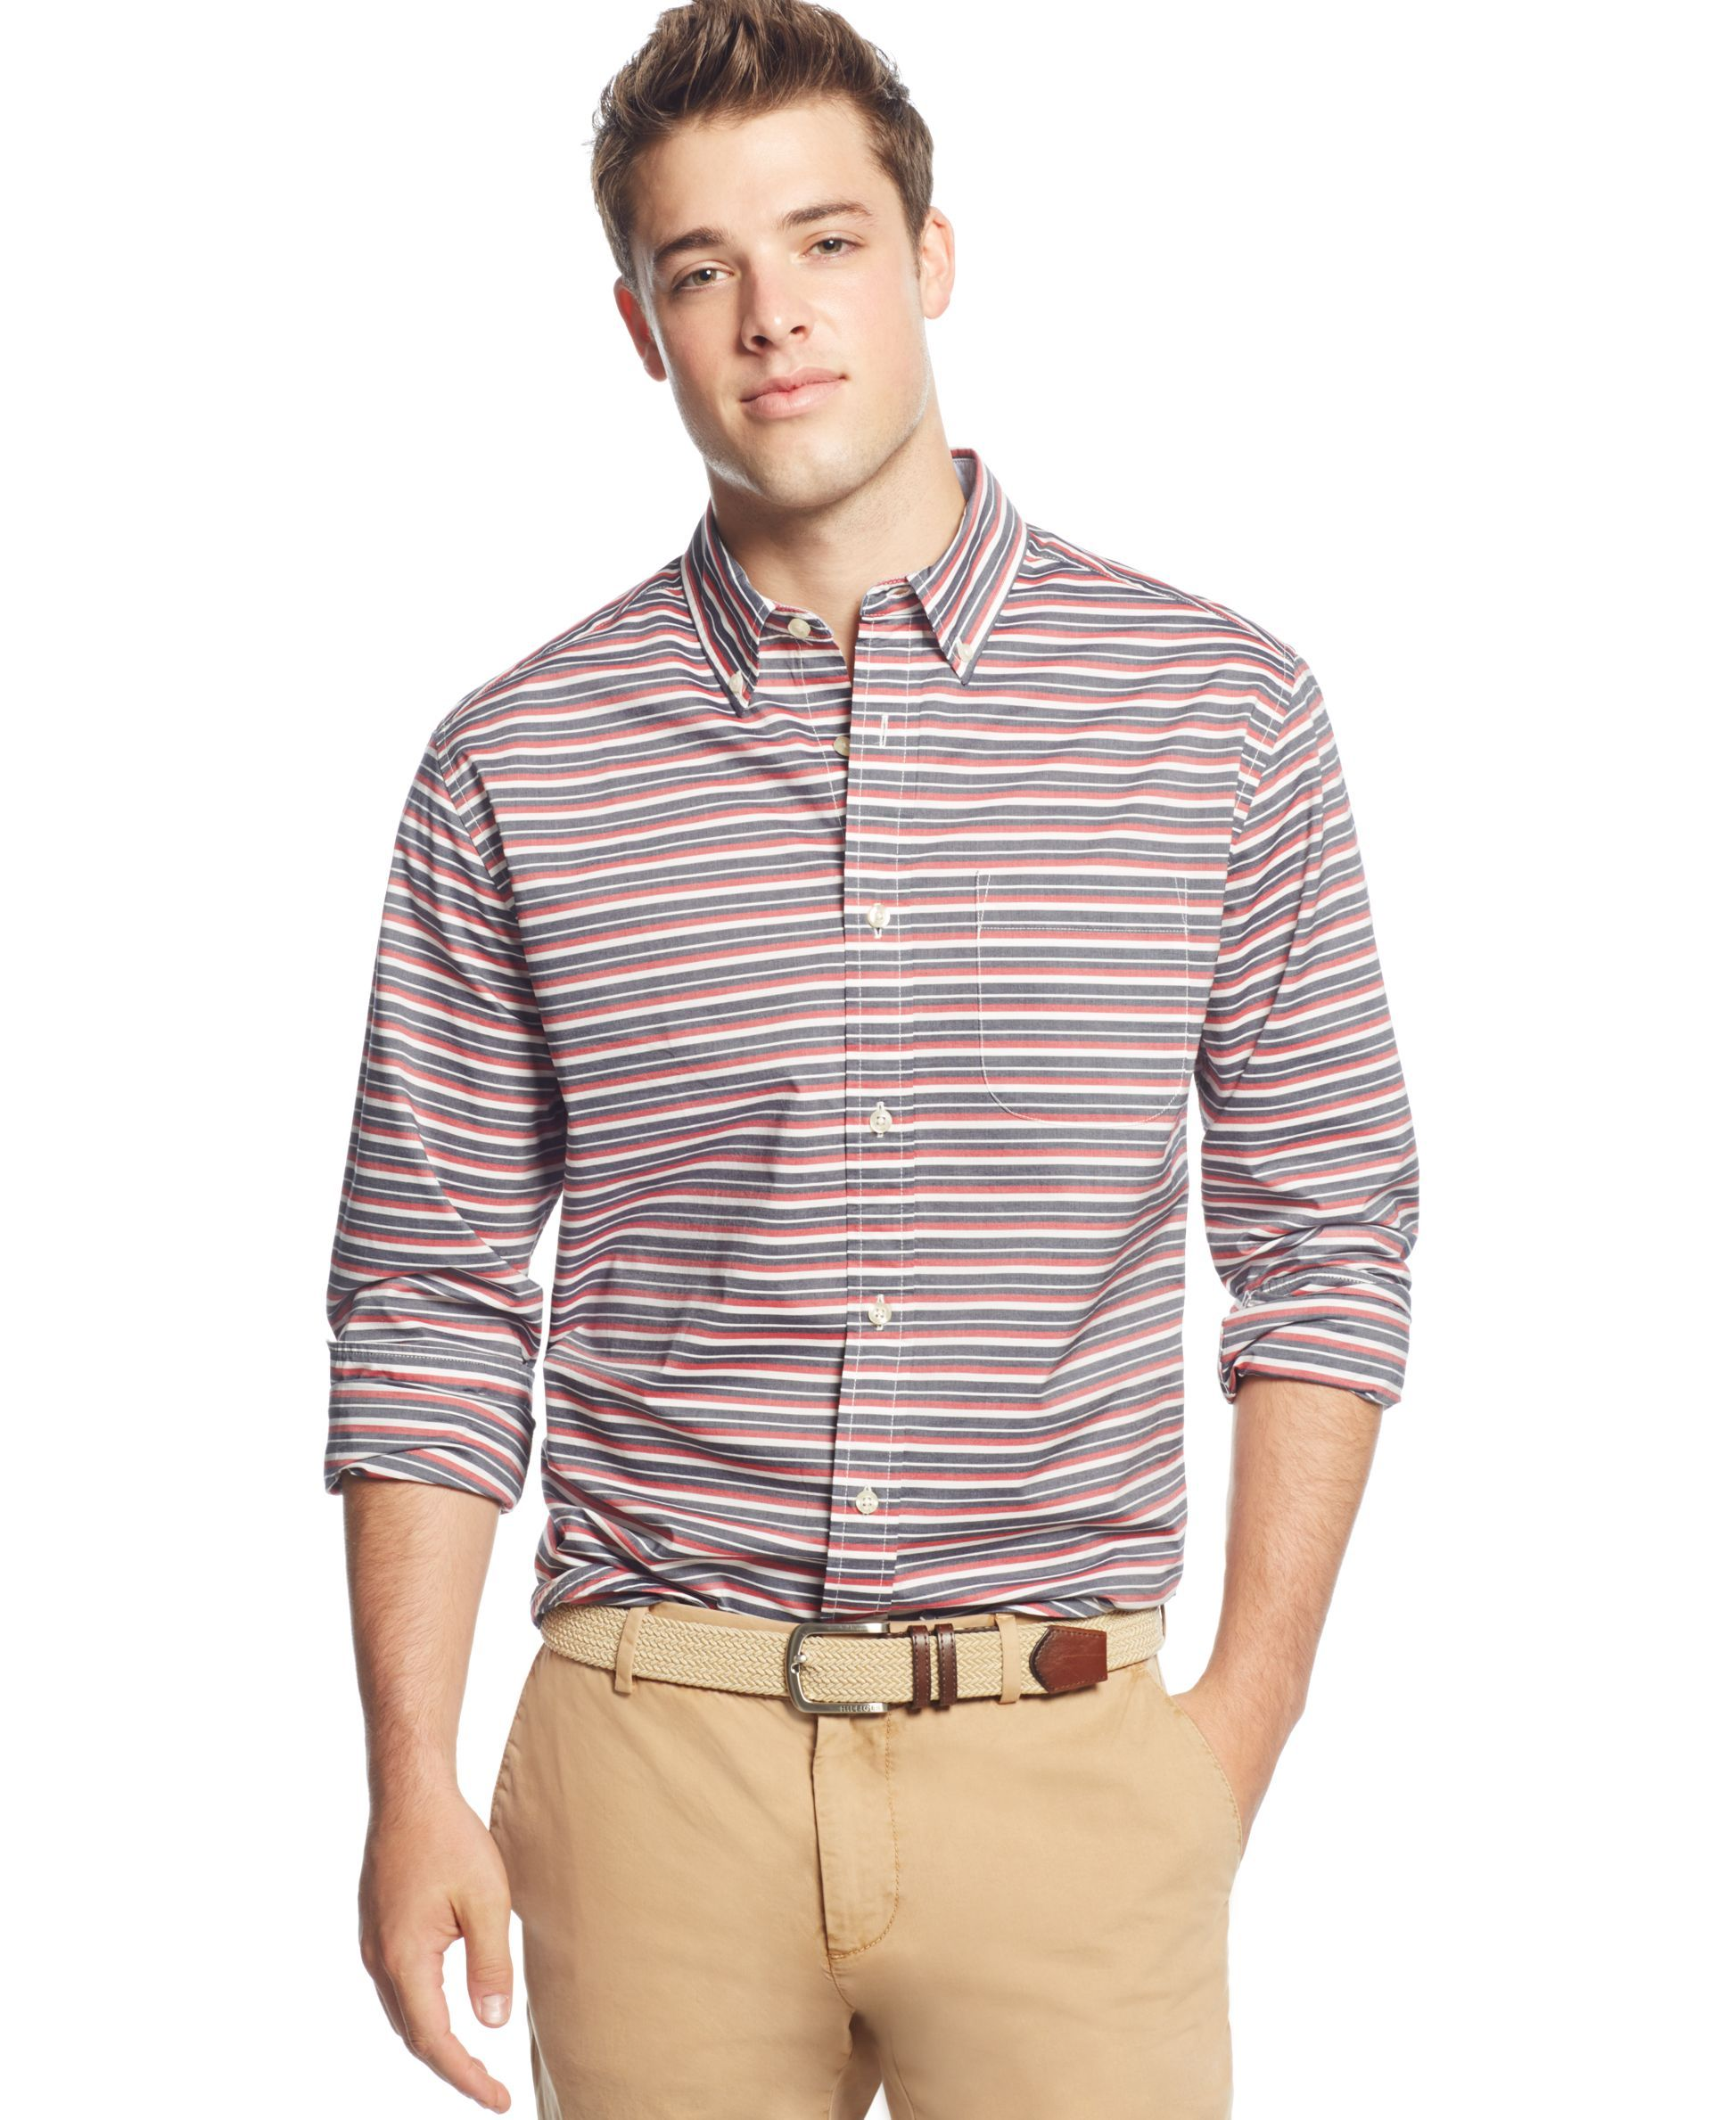 c3fea8c8 Tommy Hilfiger Active Horizontal Stripe Long-Sleeve Button-Down Shirt